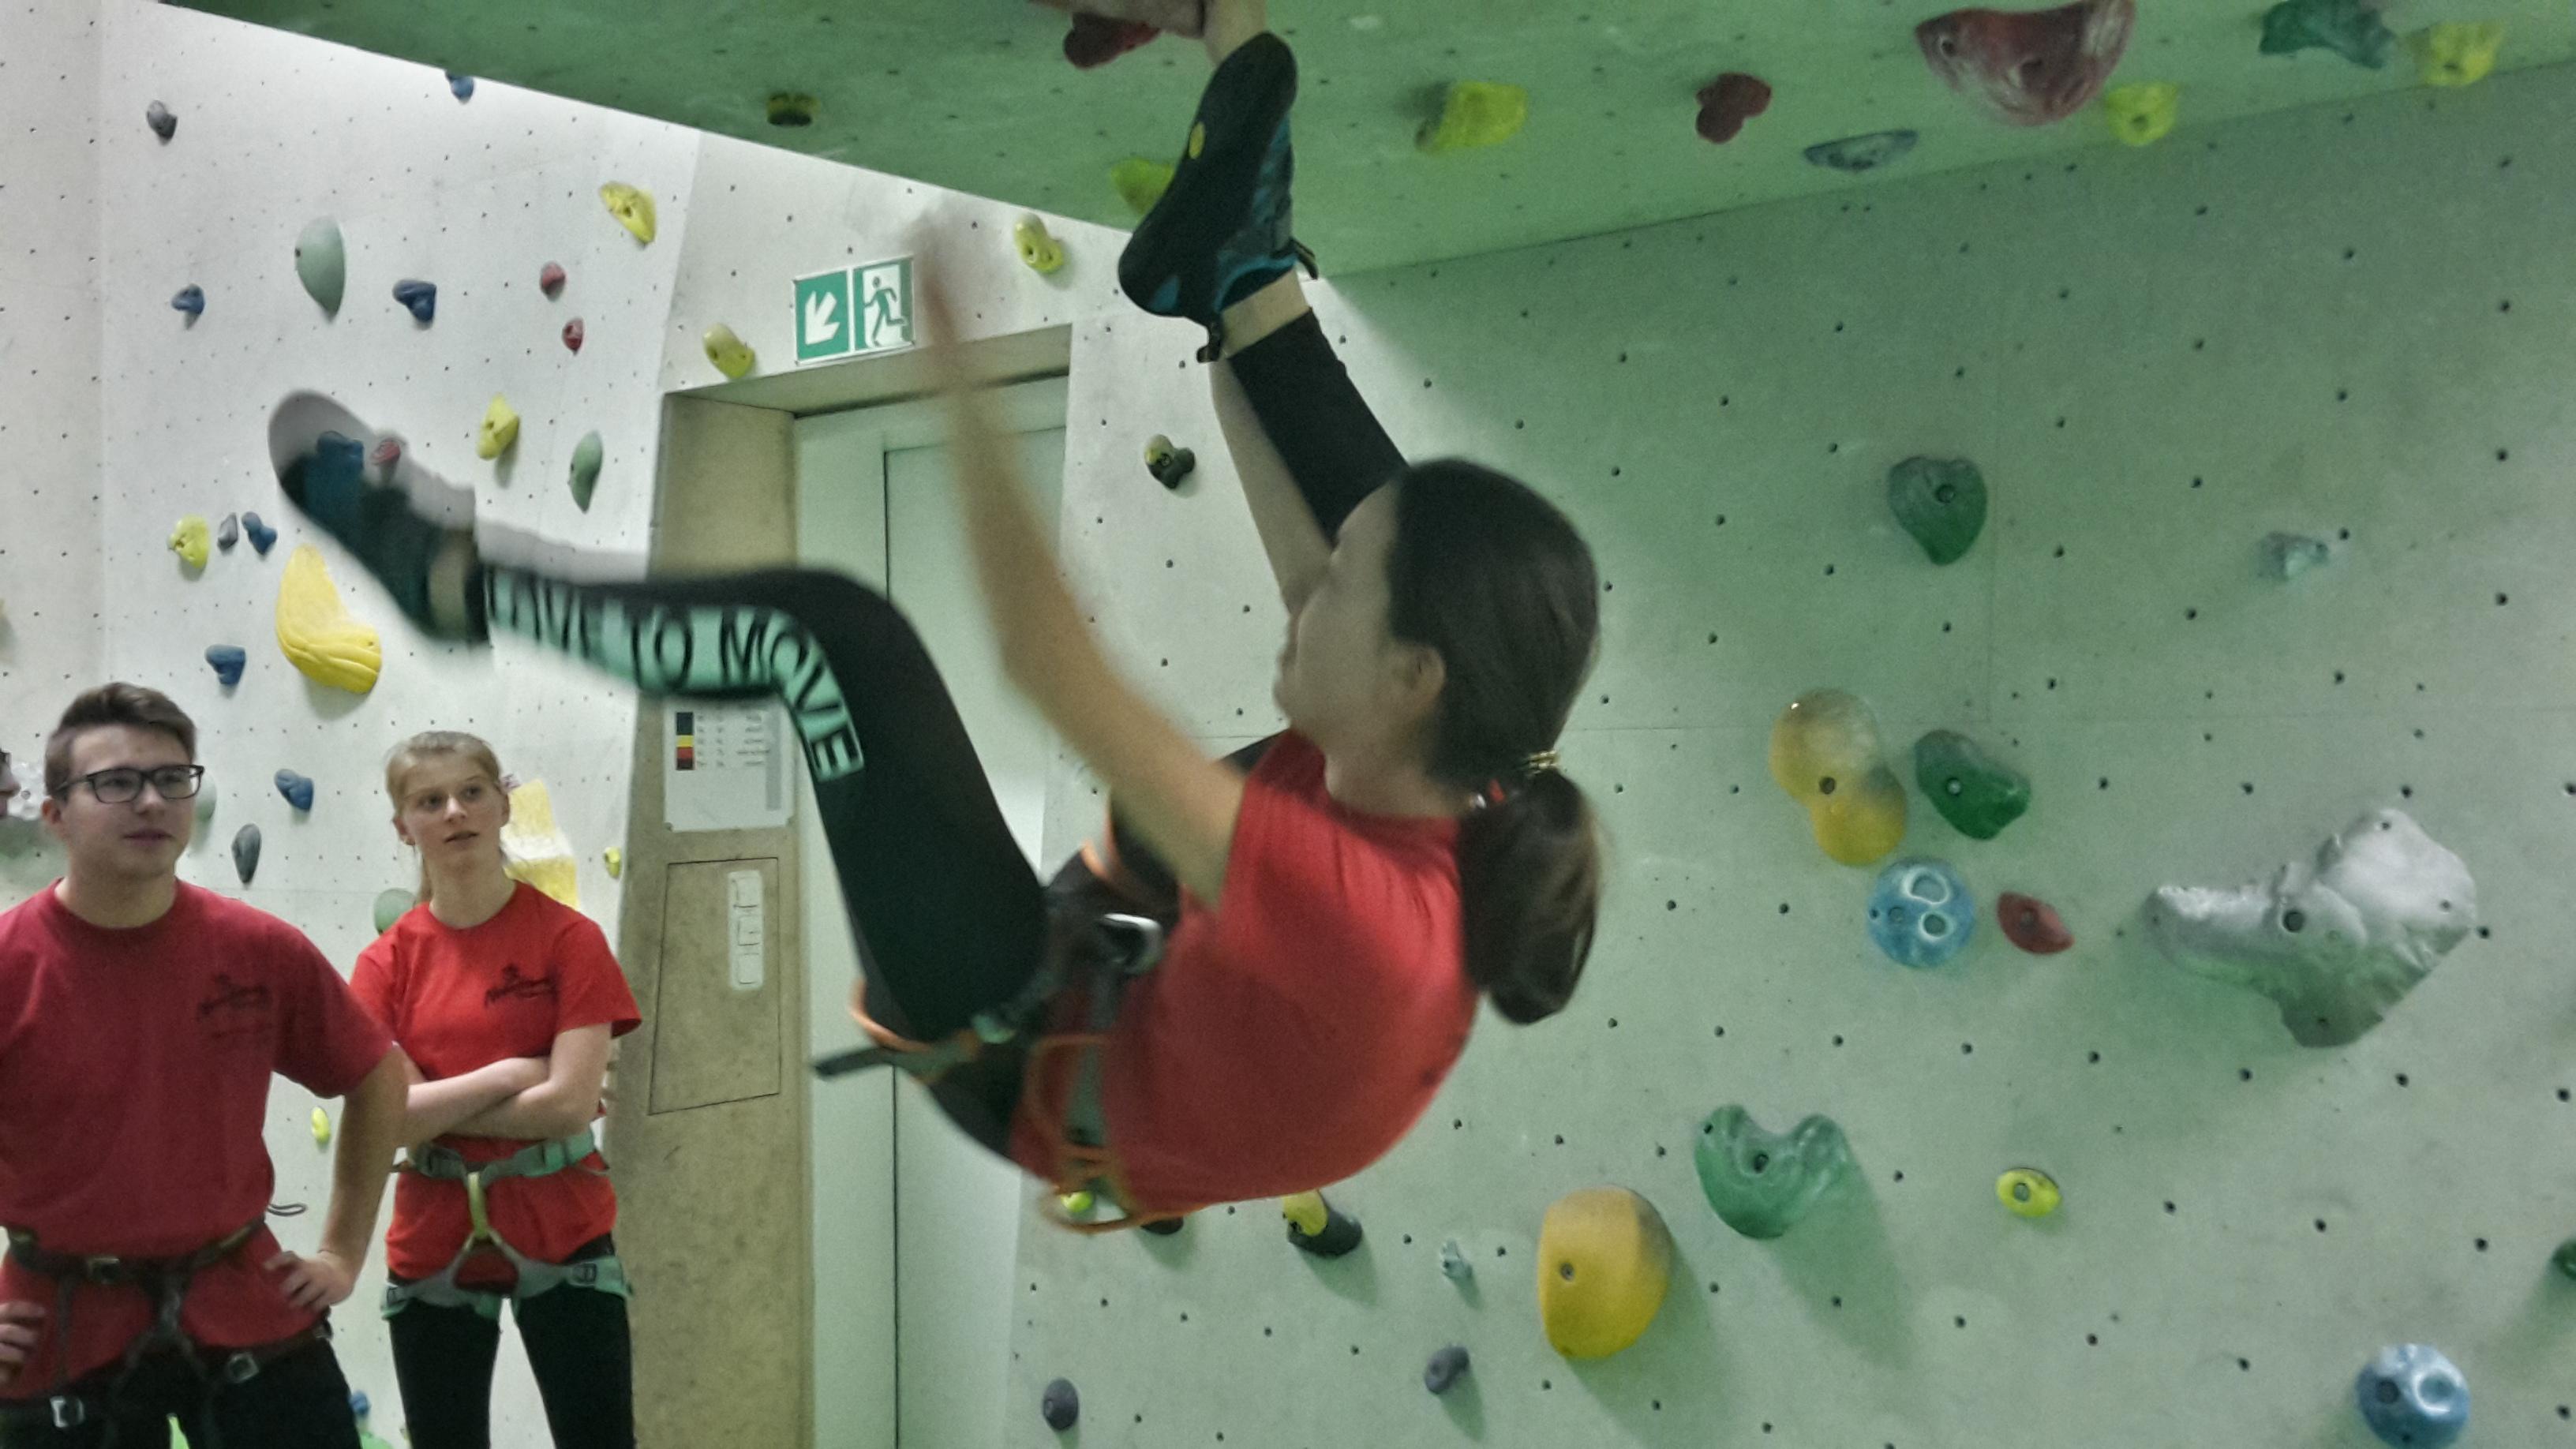 Indoorklettern-Klettertraining der Gruppe 2 ROT: 18:00 Uhr – 19:30 Uhr